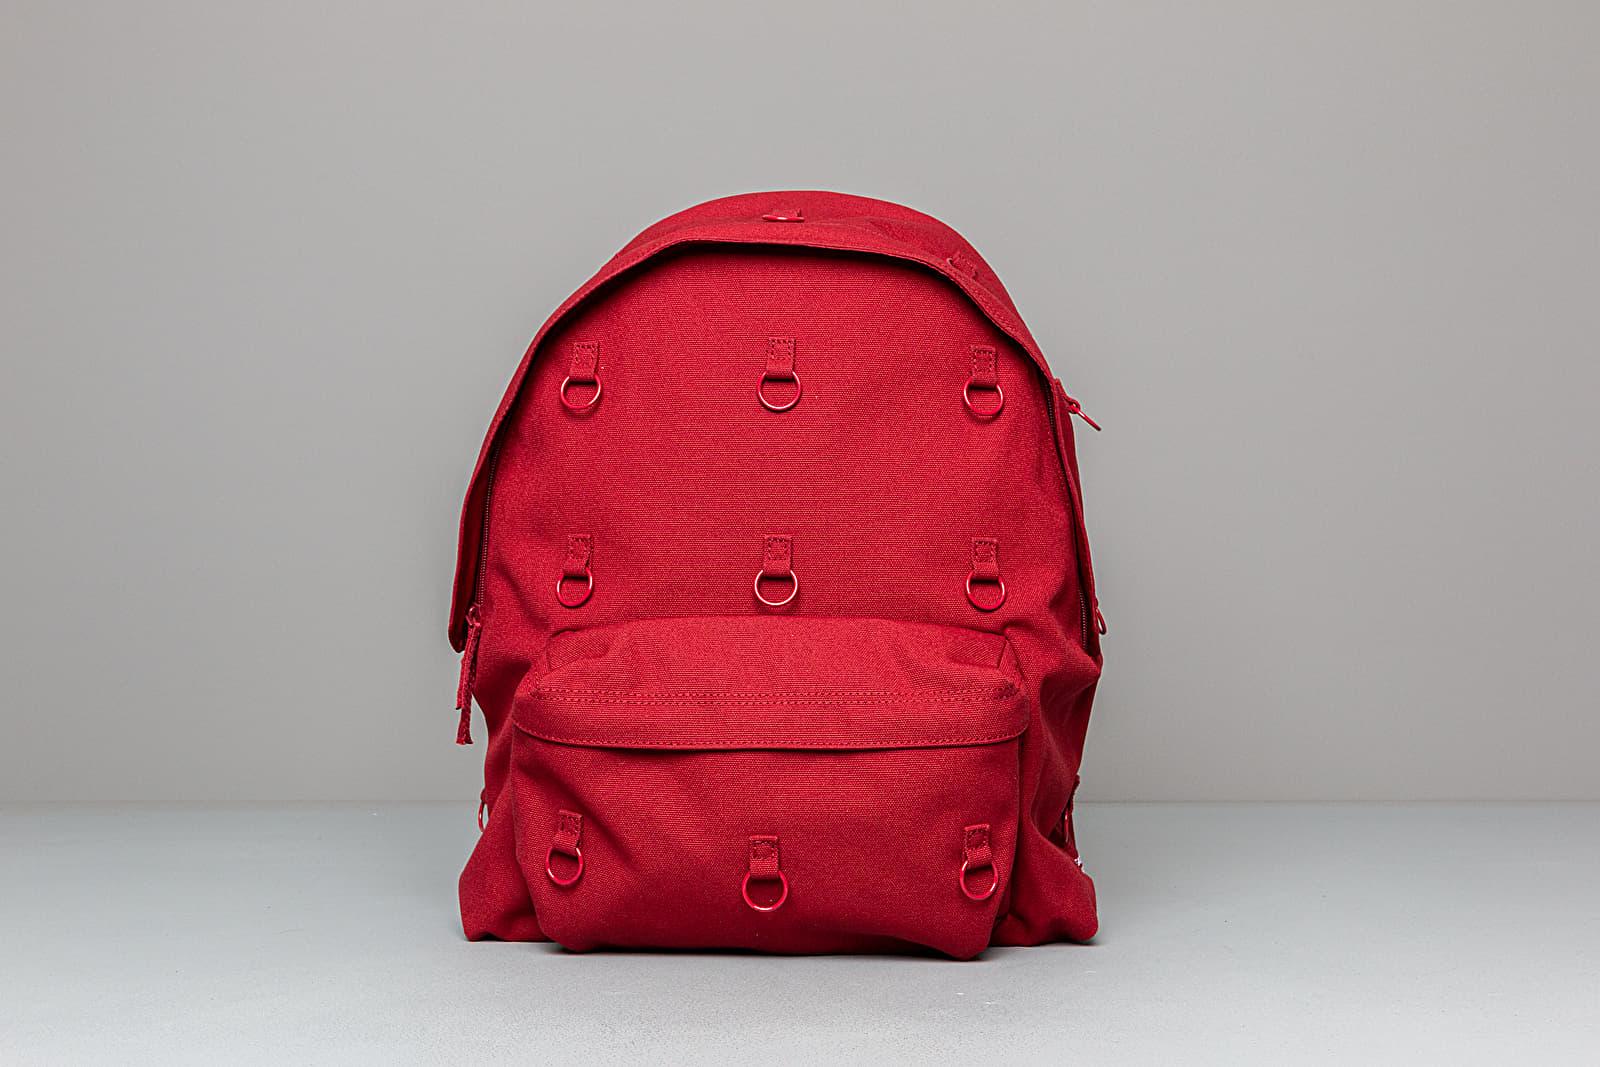 Eastpak x Raf Simons Padded Loop Bag